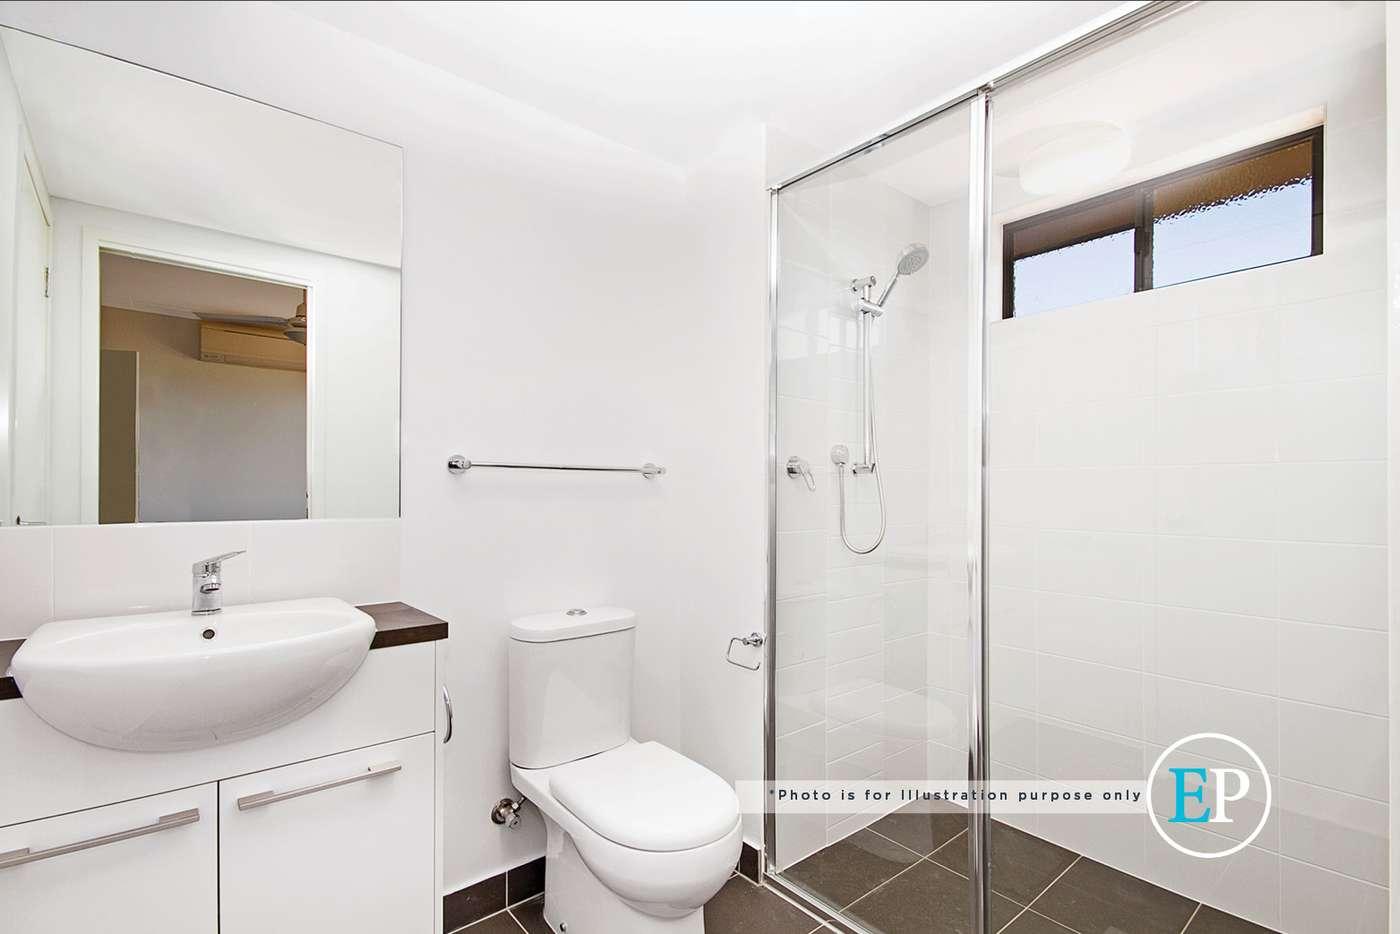 Sixth view of Homely unit listing, 310/167-173 Bundock Street, Belgian Gardens QLD 4810